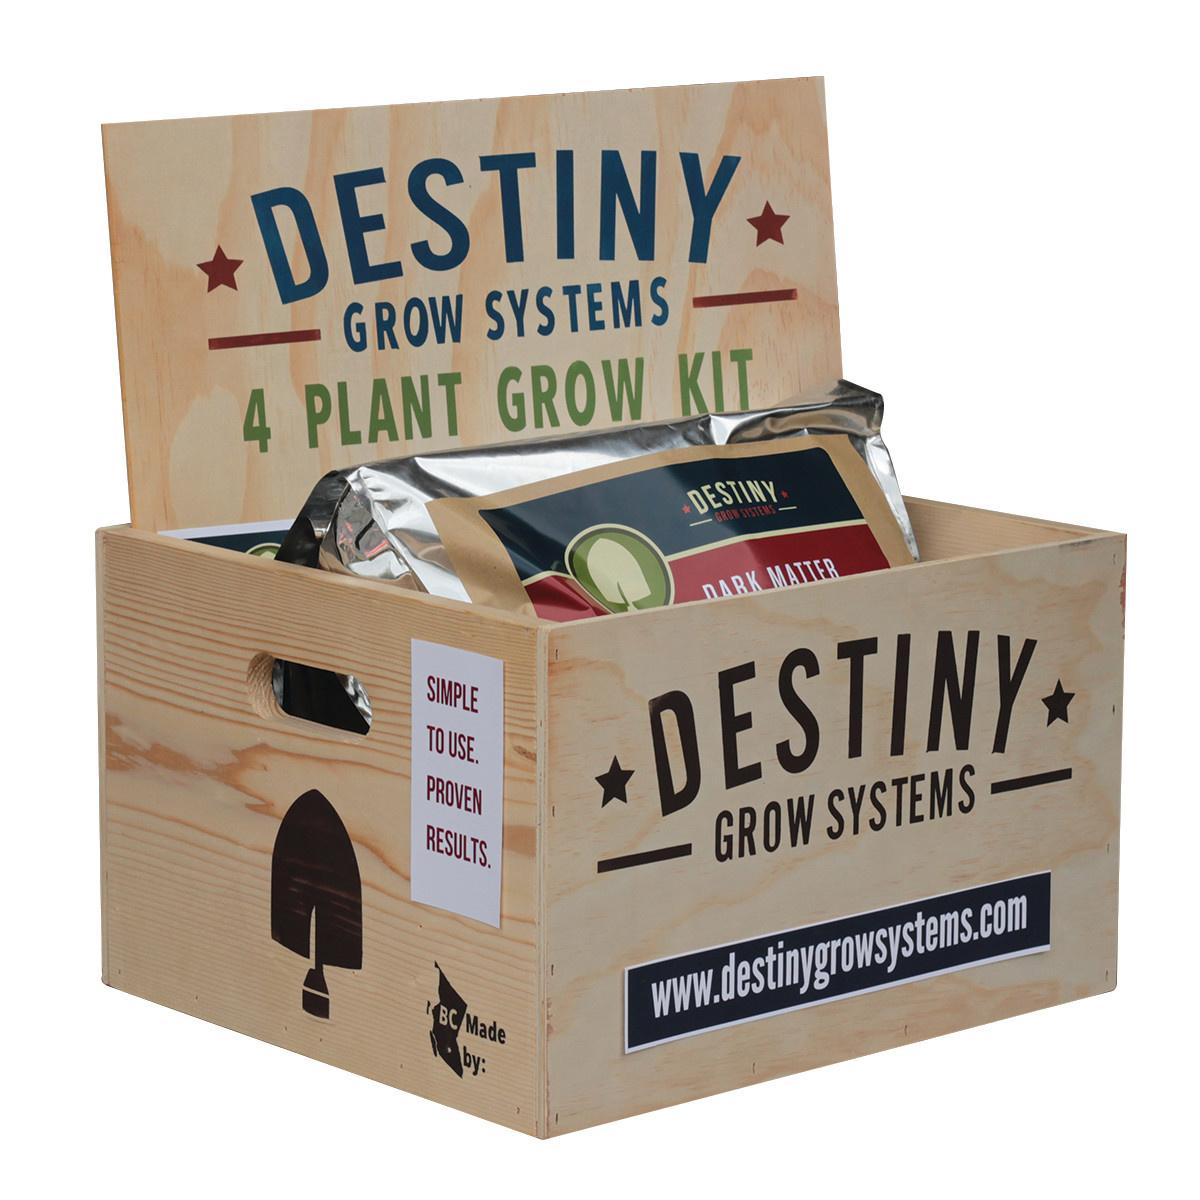 DESTINY 4 PLANT KIT